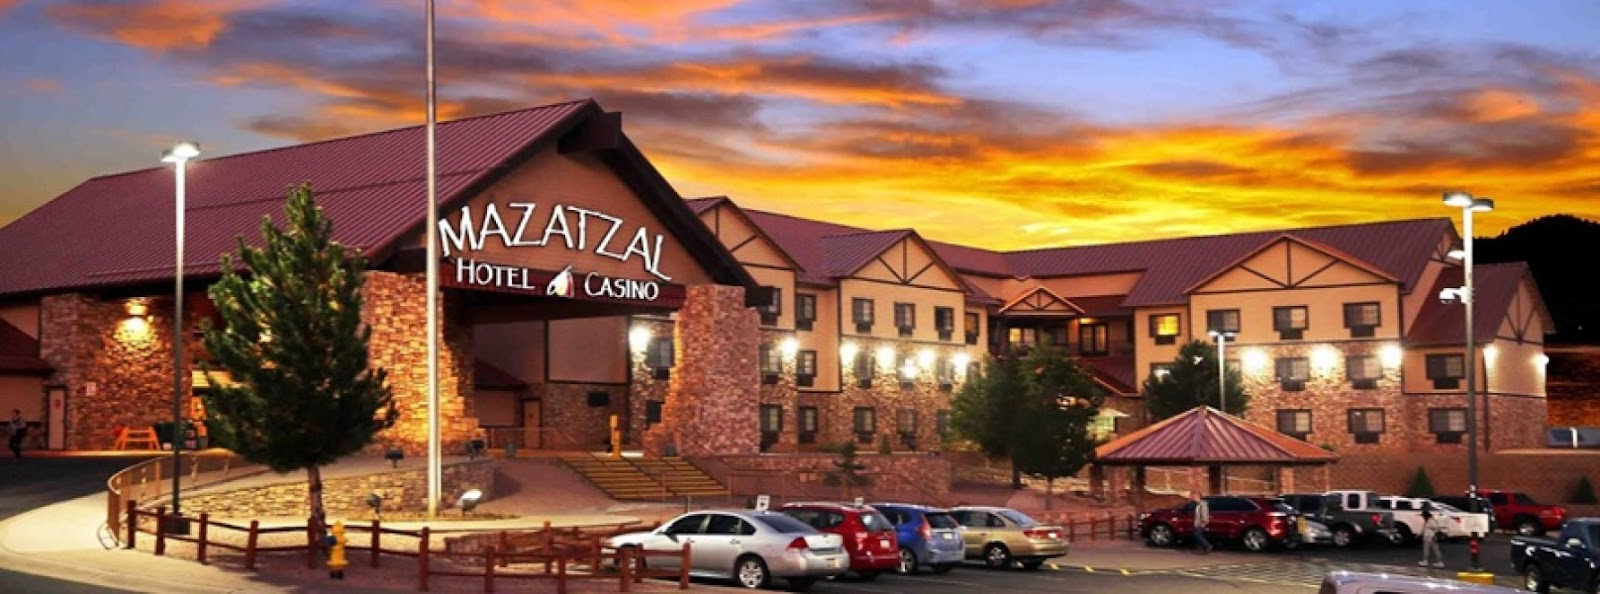 Mazatzal Mountains and Casino